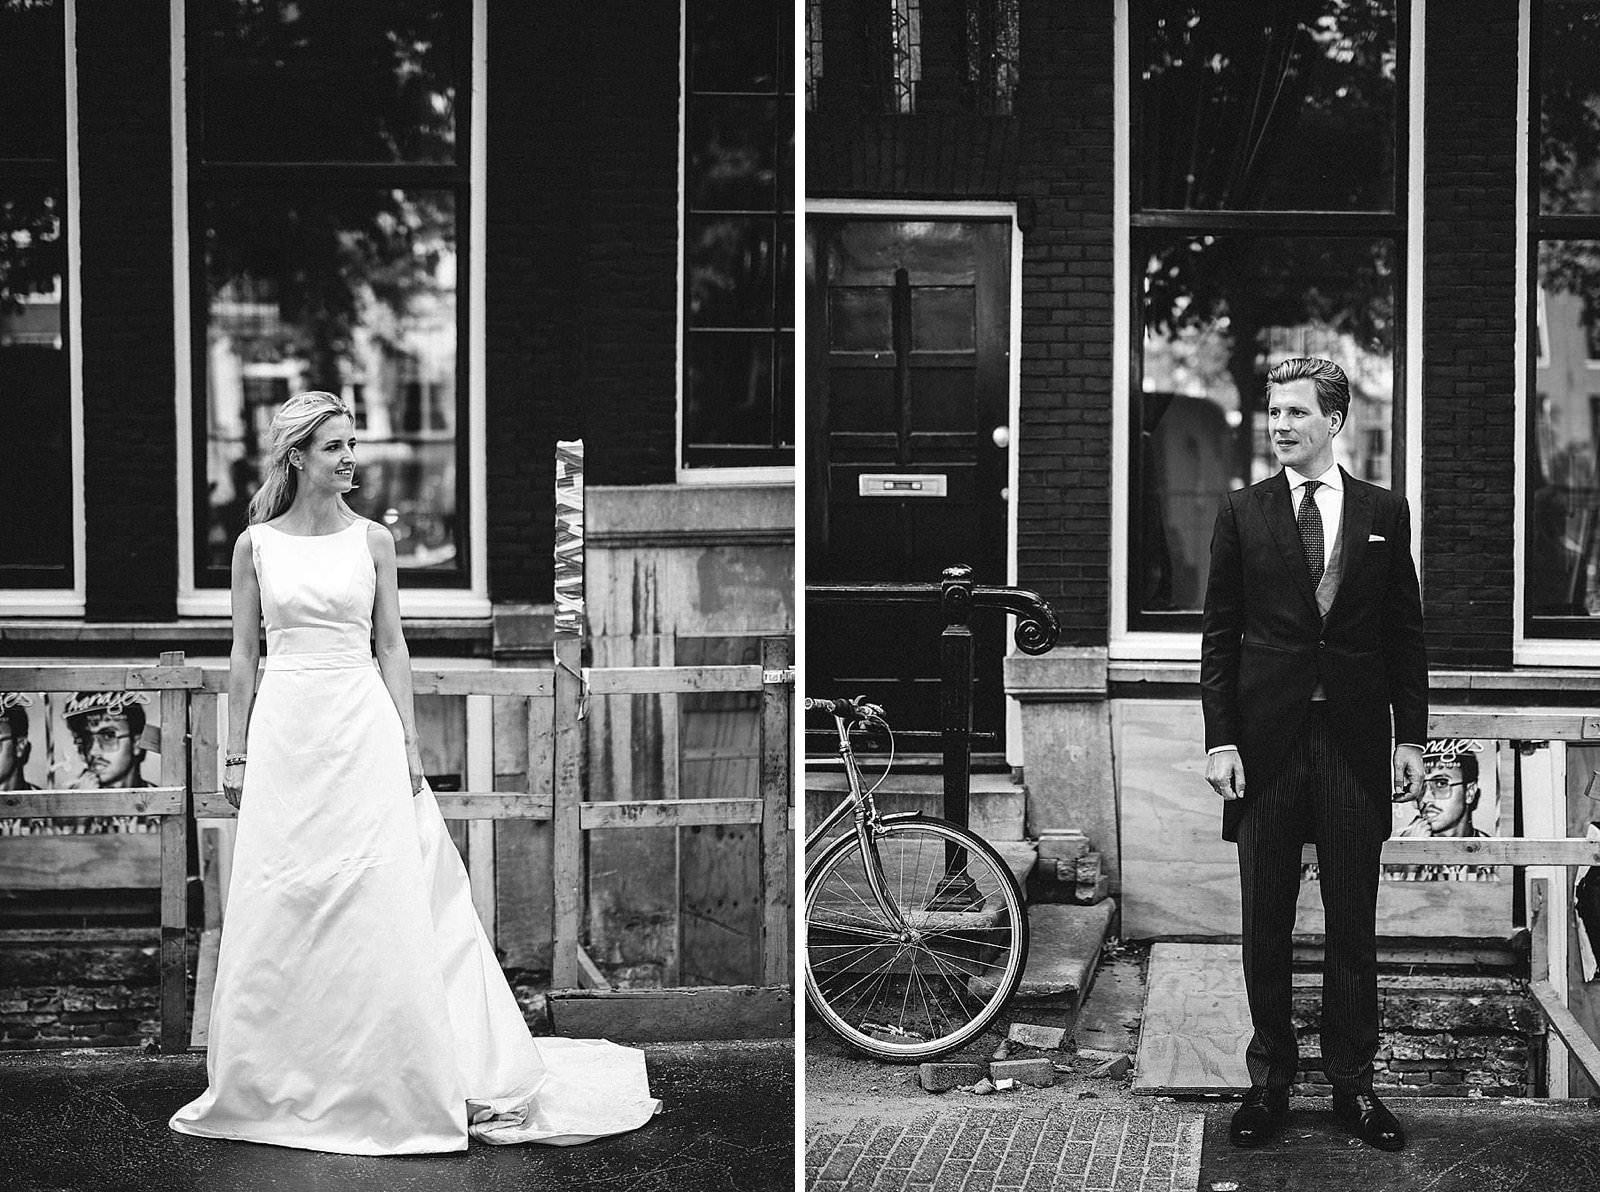 Fotograf Konstanz - Destination Wedding Photographer Amsterdam 085 S - Destination Wedding Amsterdam  - 191 -